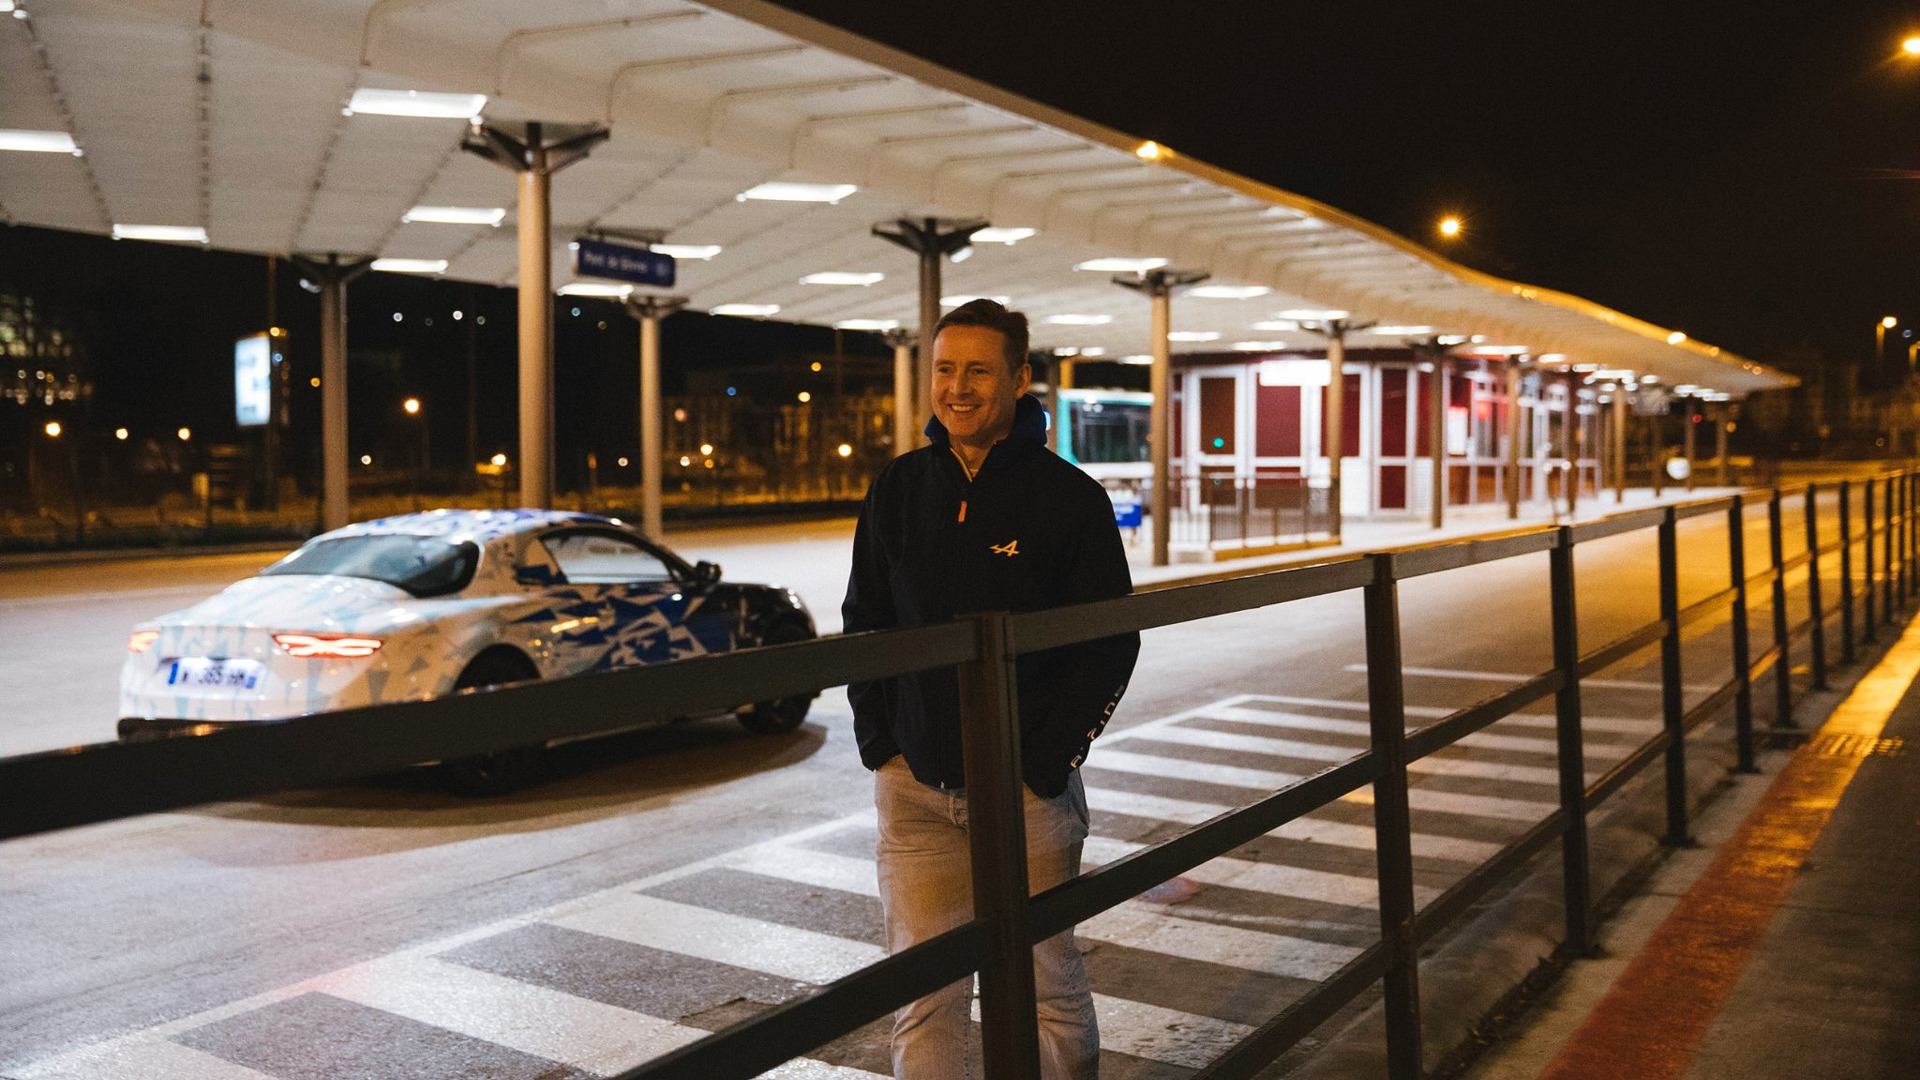 alpine-prototypes-paris-night-ride (3)